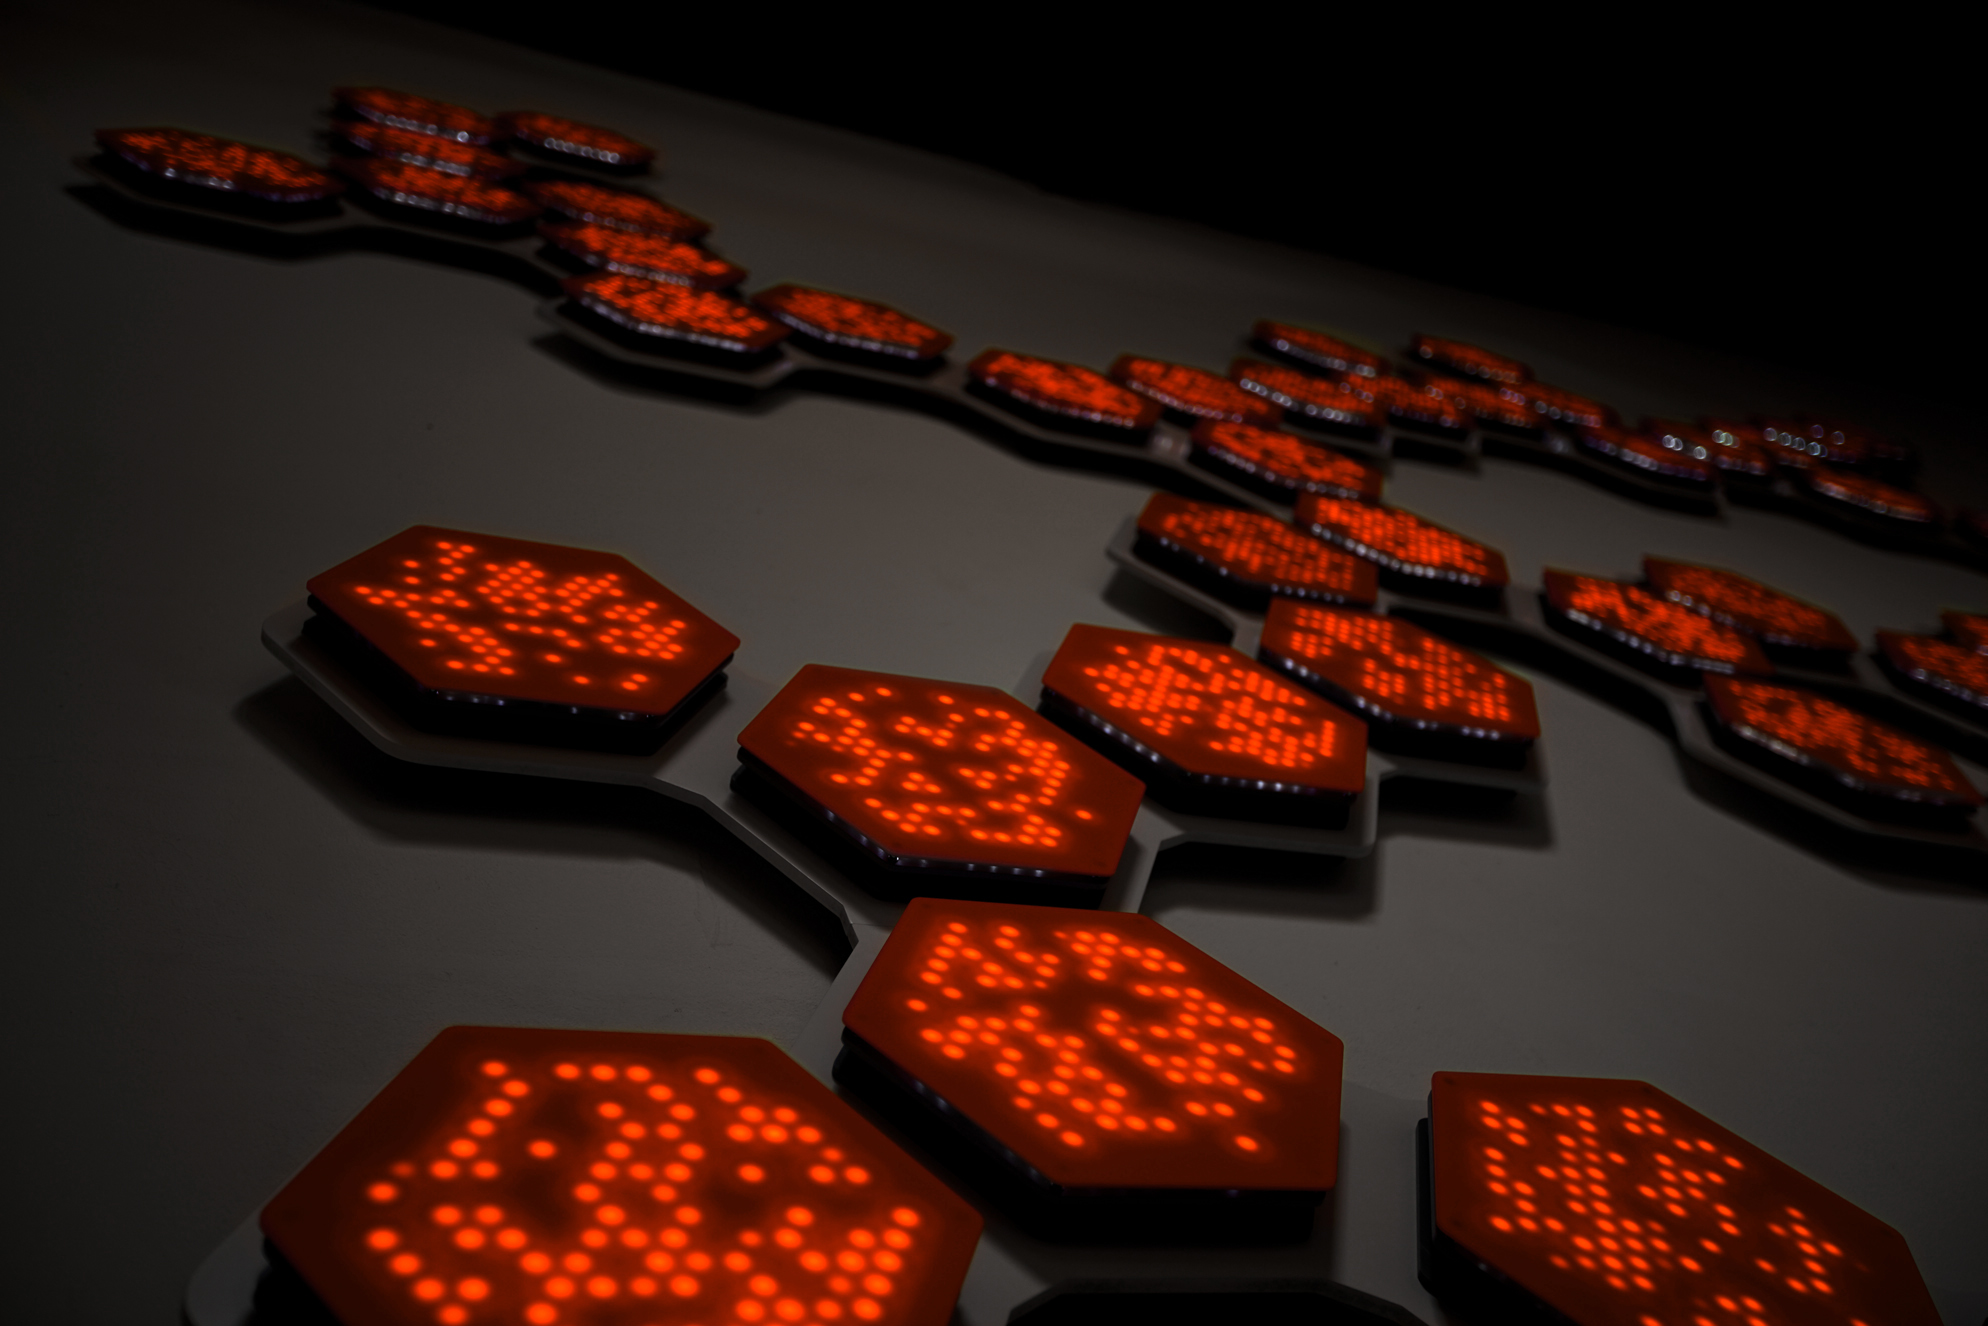 Supercomputer06